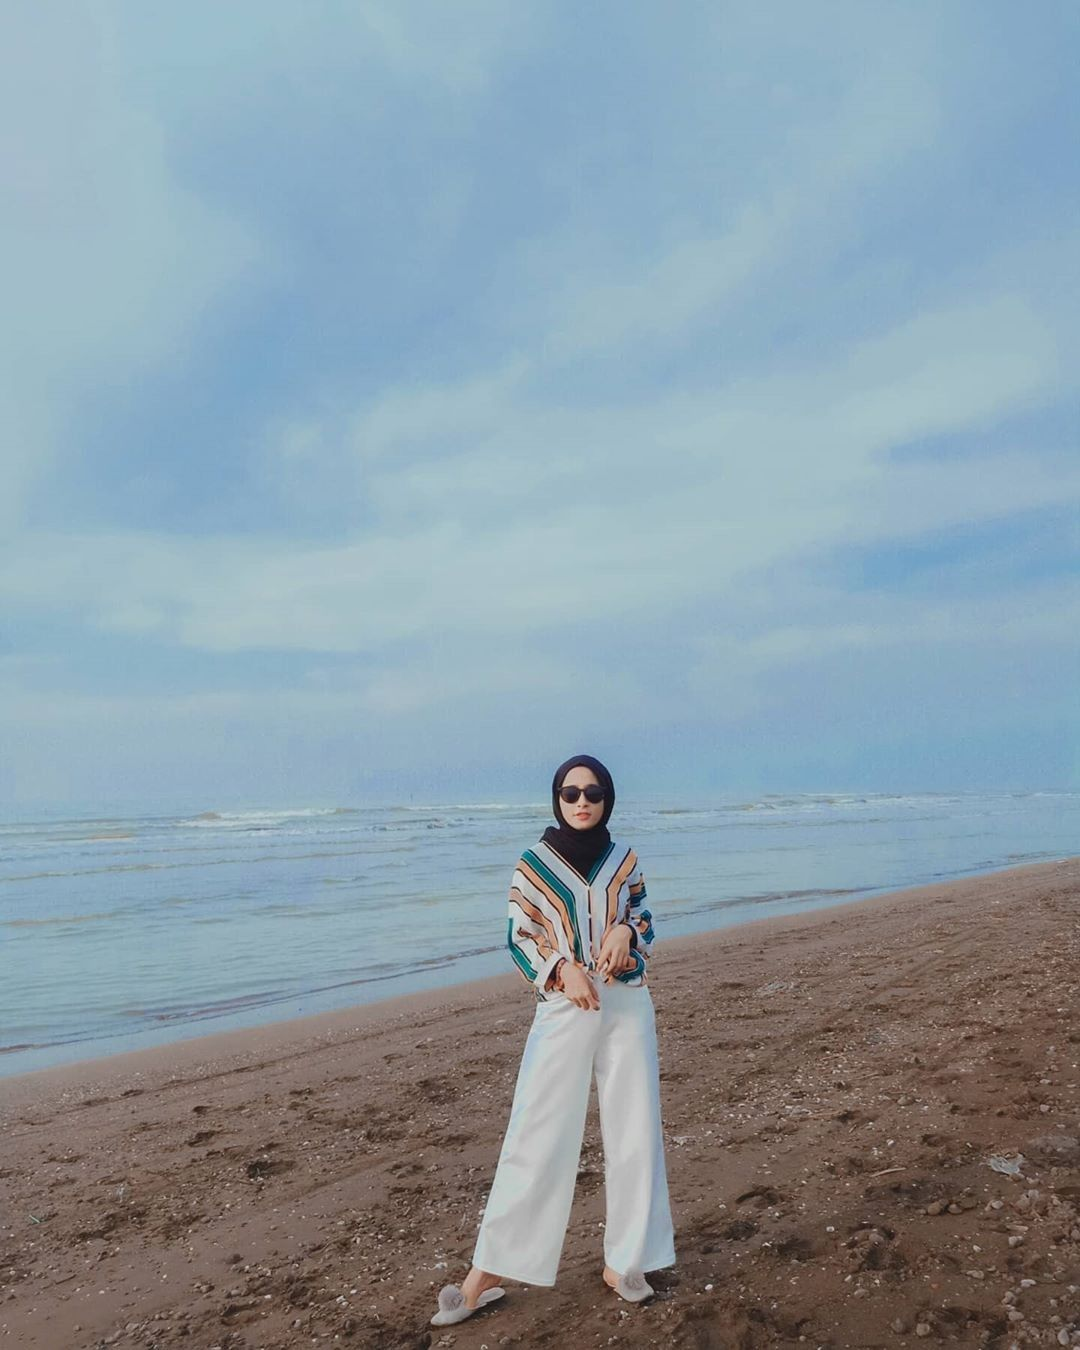 Baju Pantai Hijab Sederhana